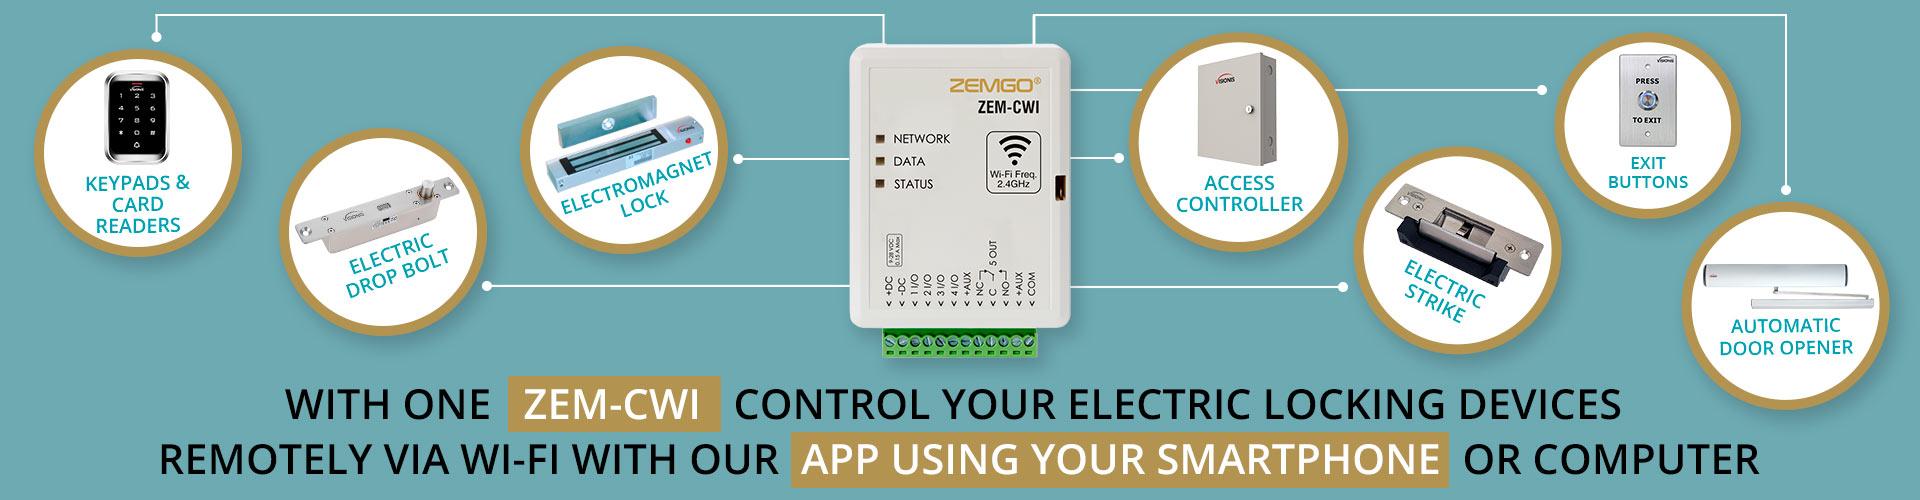 wifi smart controller zem-cwi